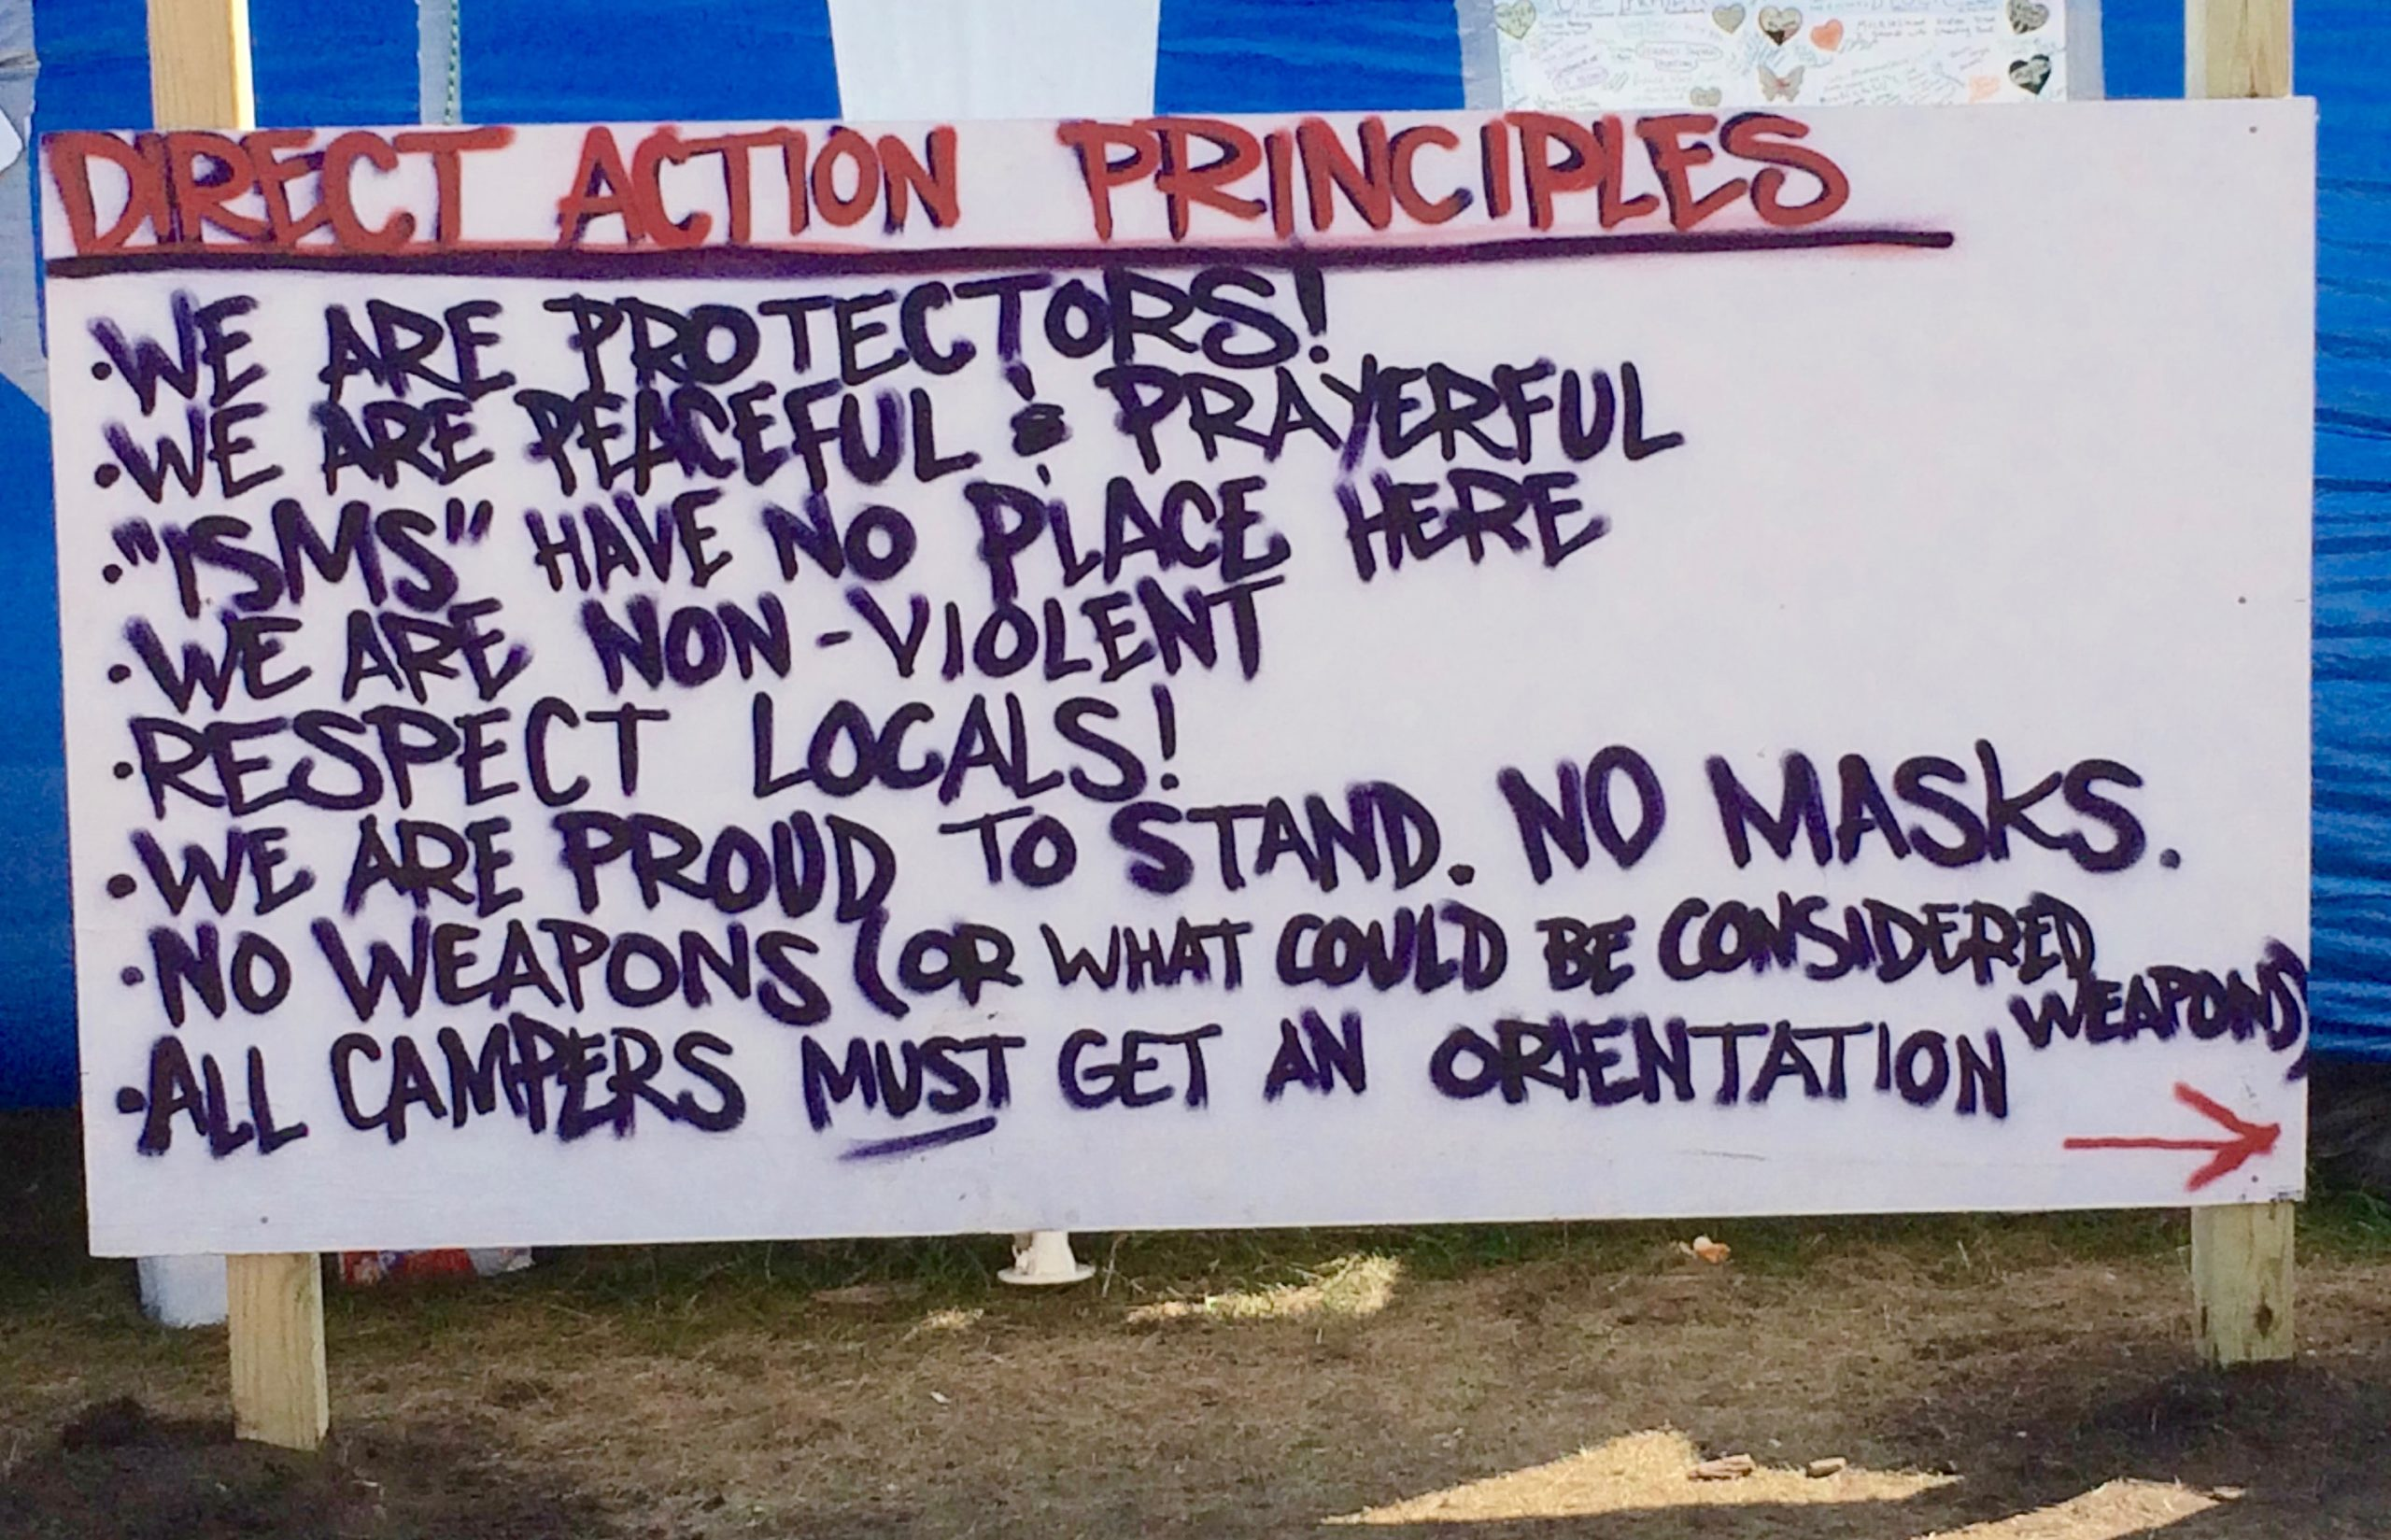 Sign at the Oceti Sakowin Camp. Photo credit: Ken Gingerich